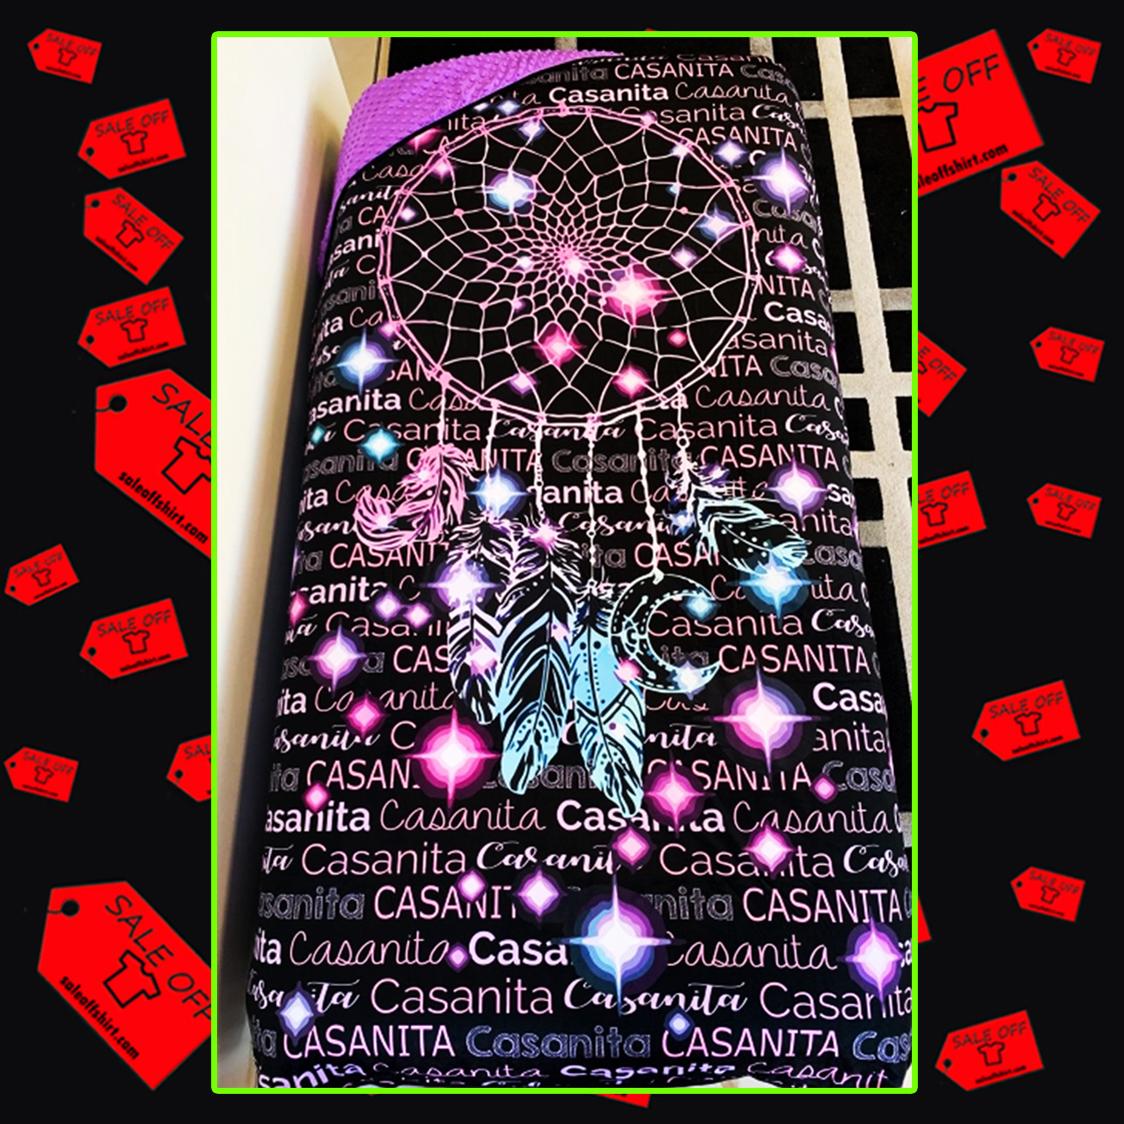 Midnight Dream Catcher Personalised Mink Blanket - queen (70x80 inches)